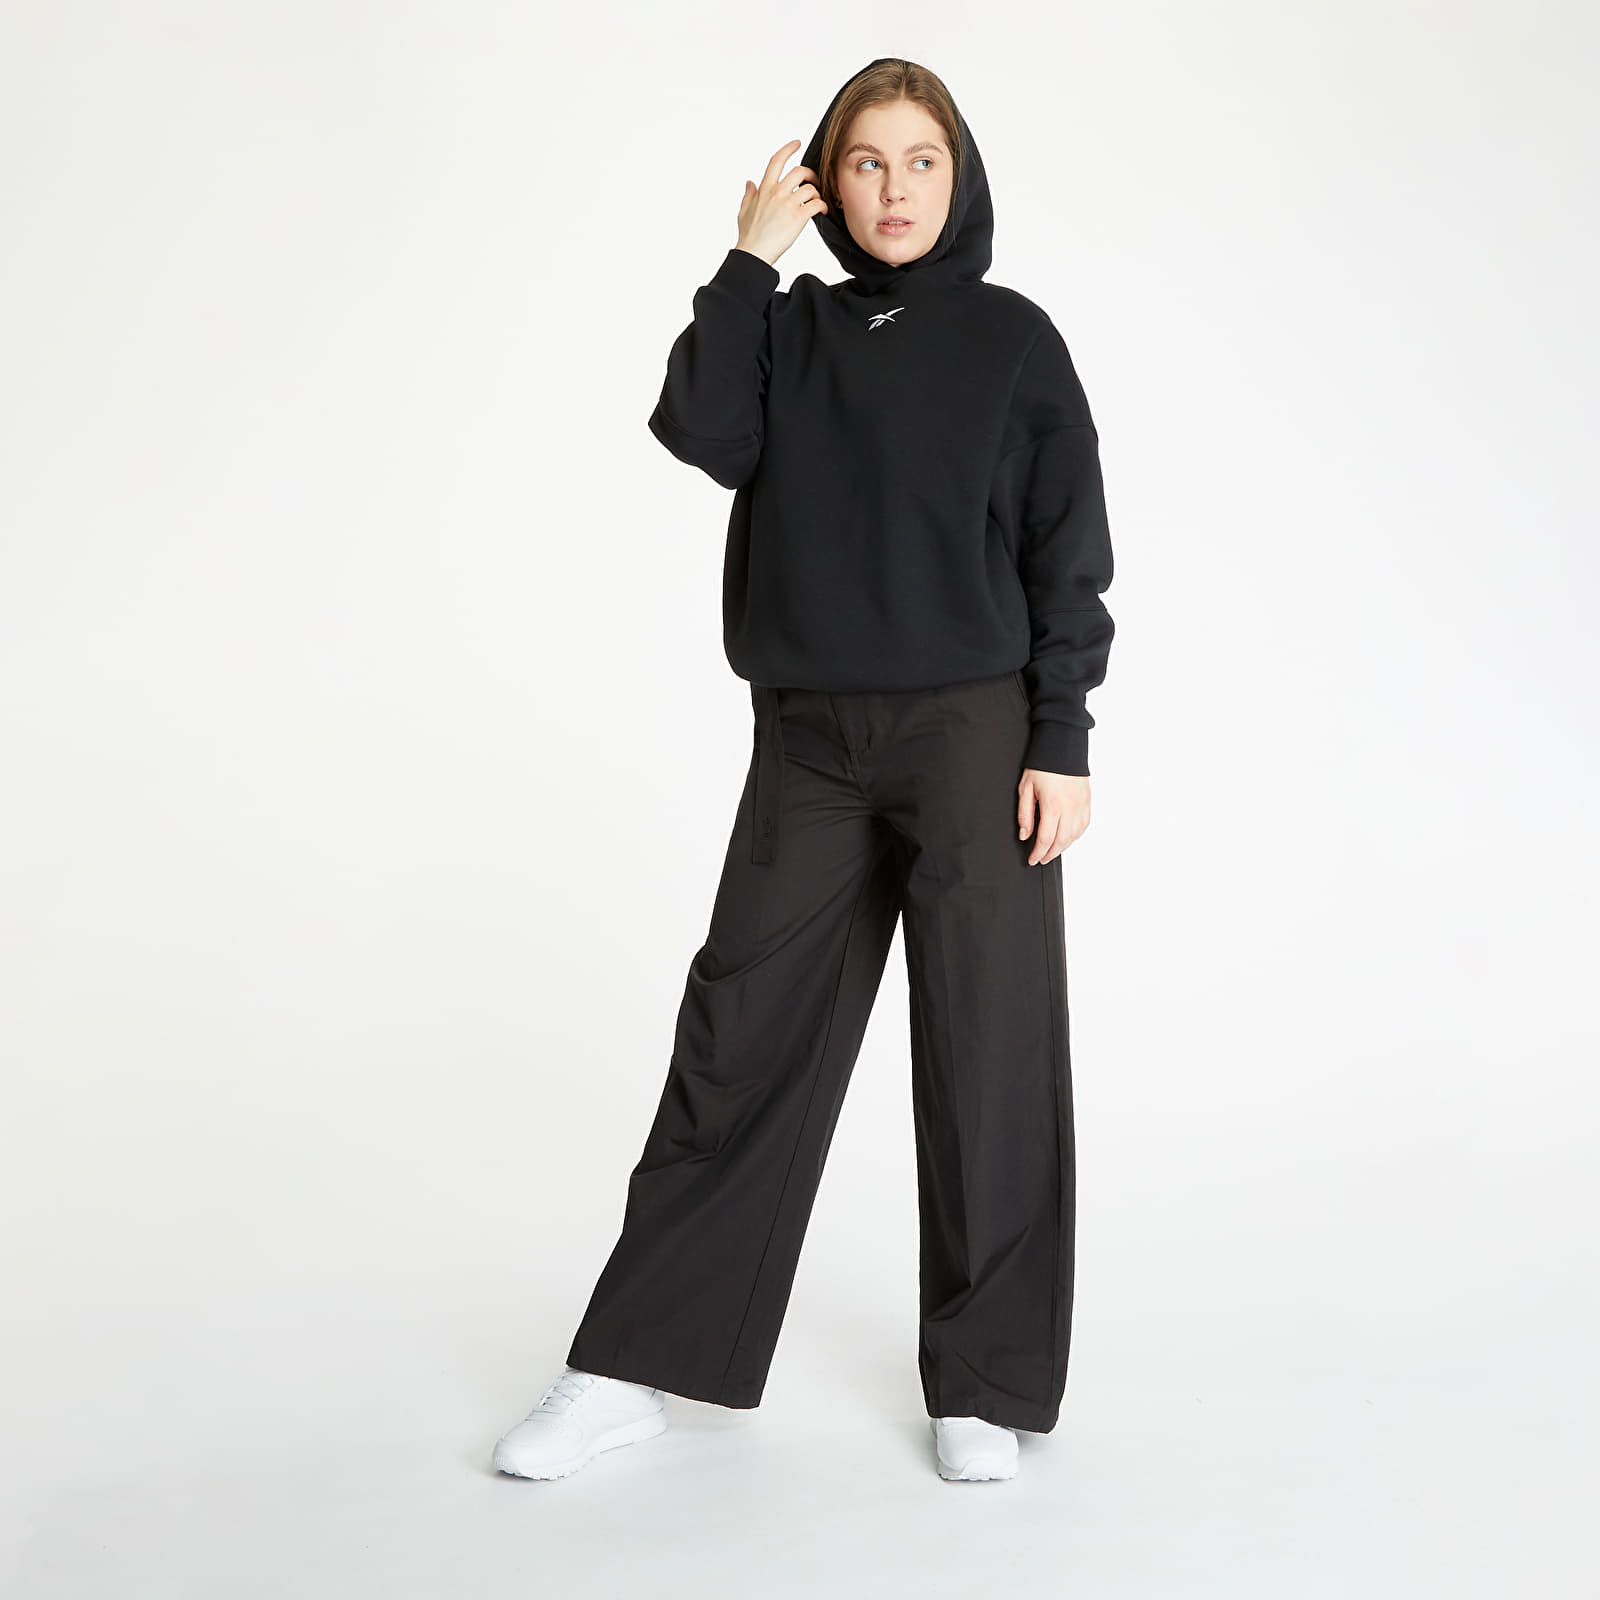 Sweatshirts Reebok Retro Oversize Hoodie Black